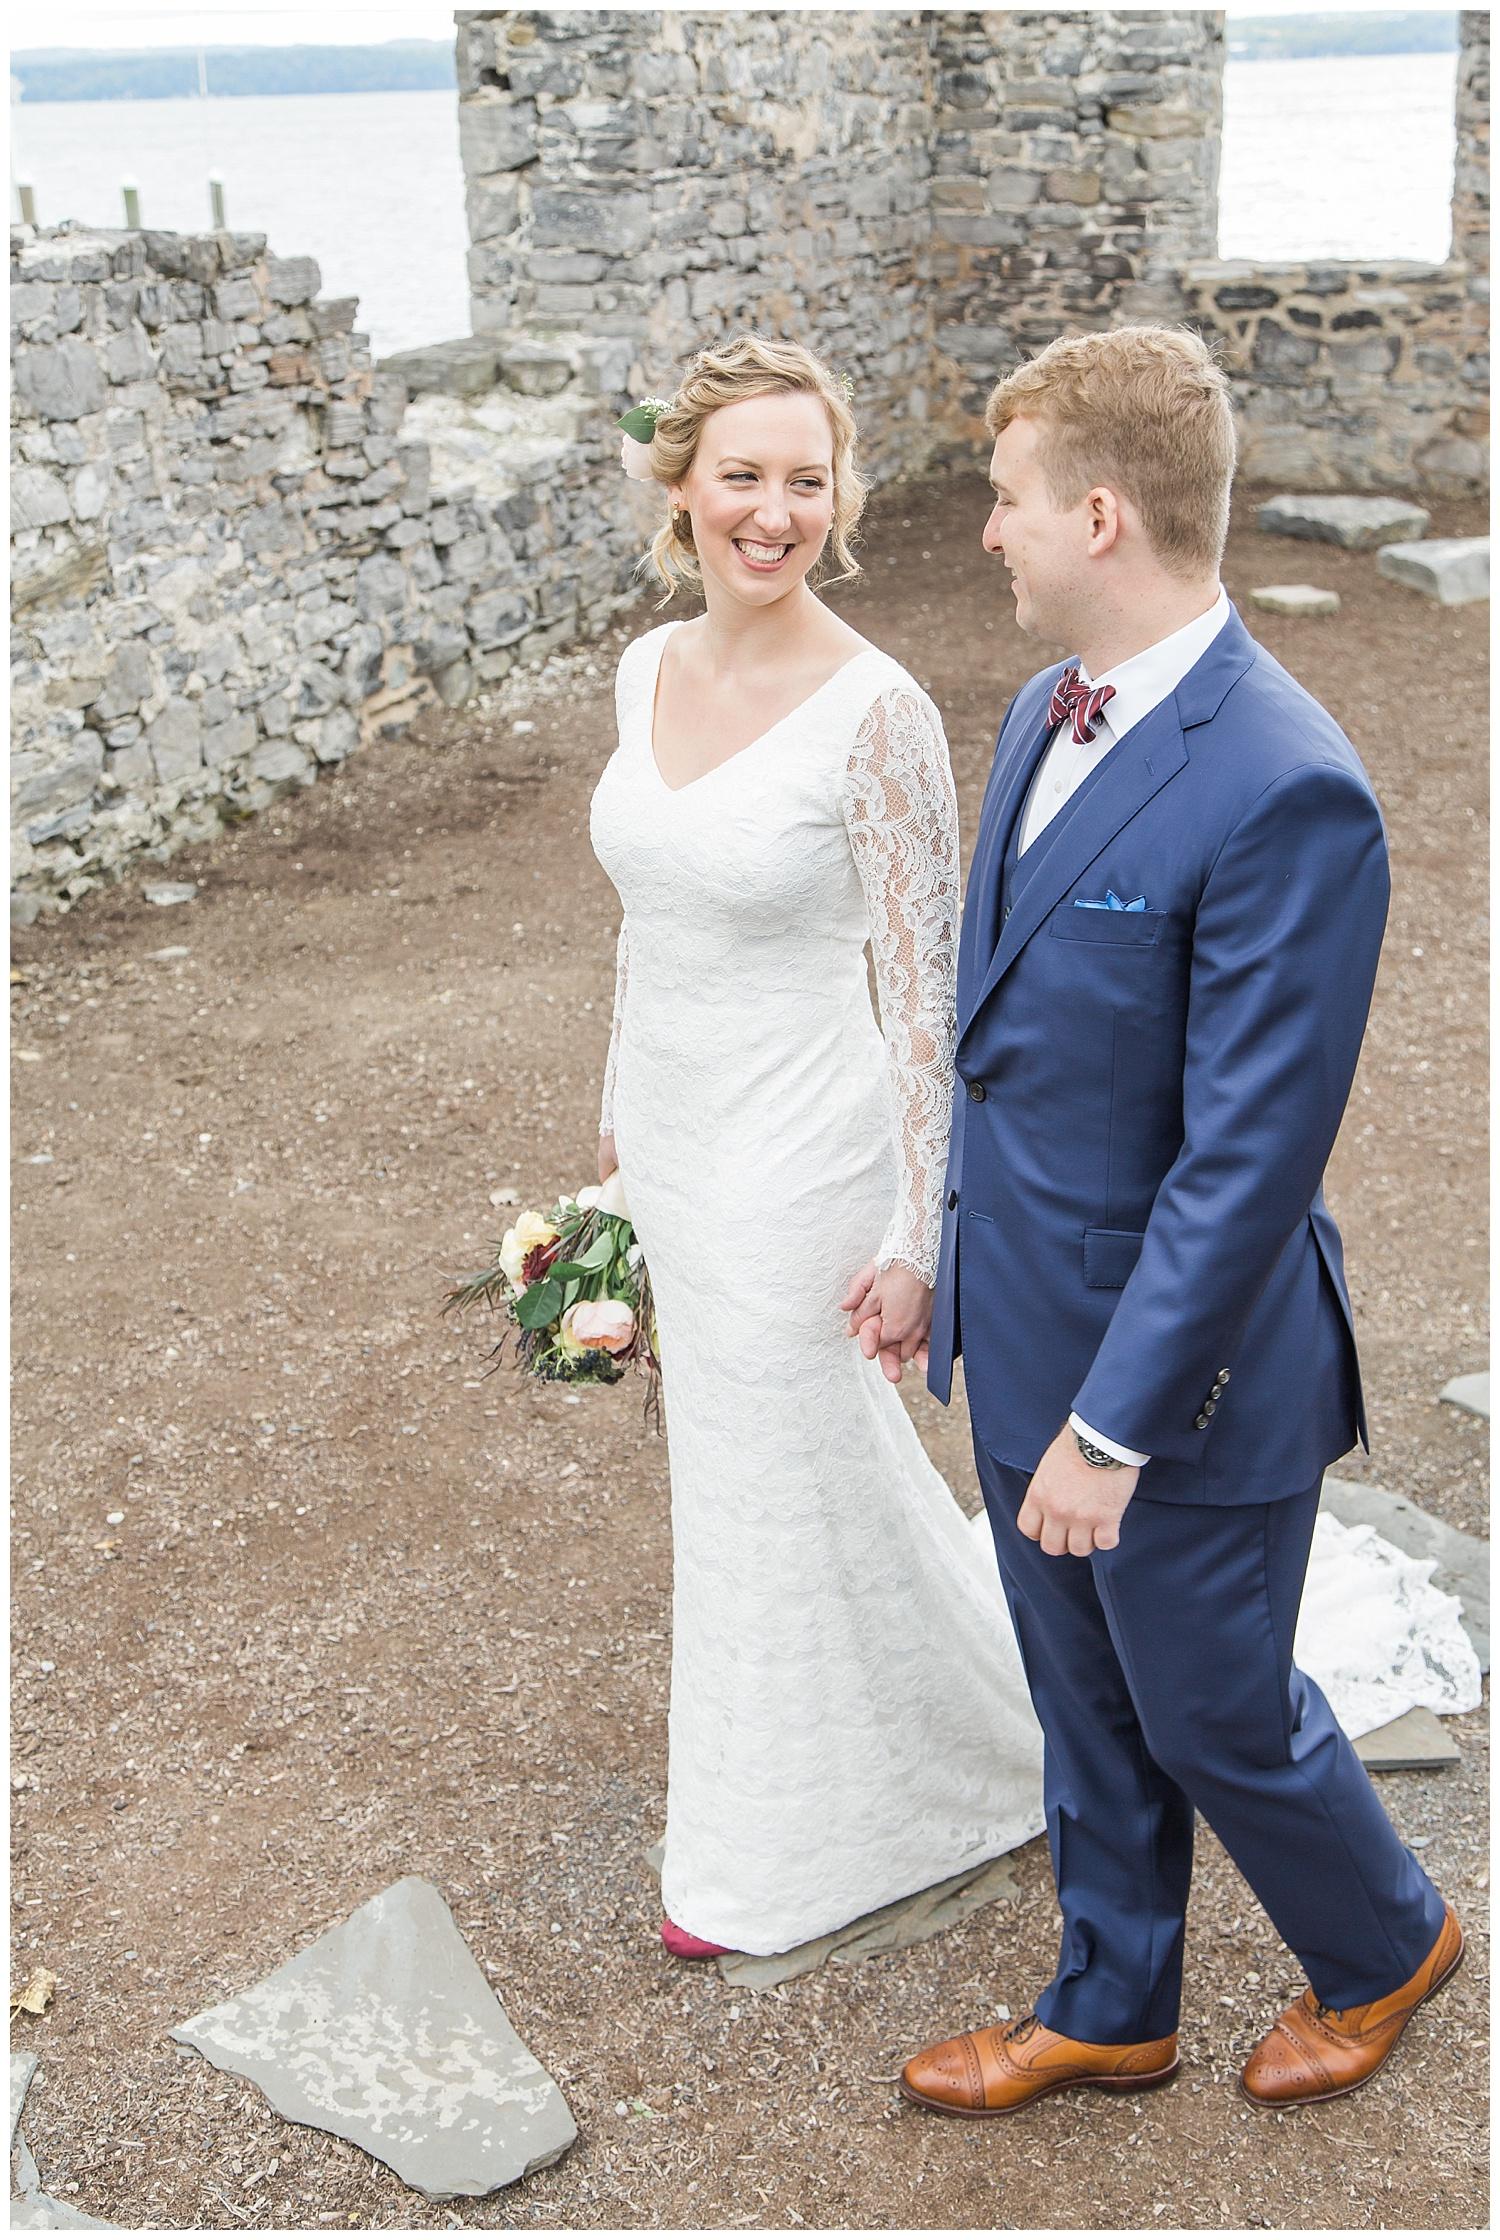 Margaret and Colin - Inns of Aurora - Lass and Beau-889_Buffalo wedding photography.jpg